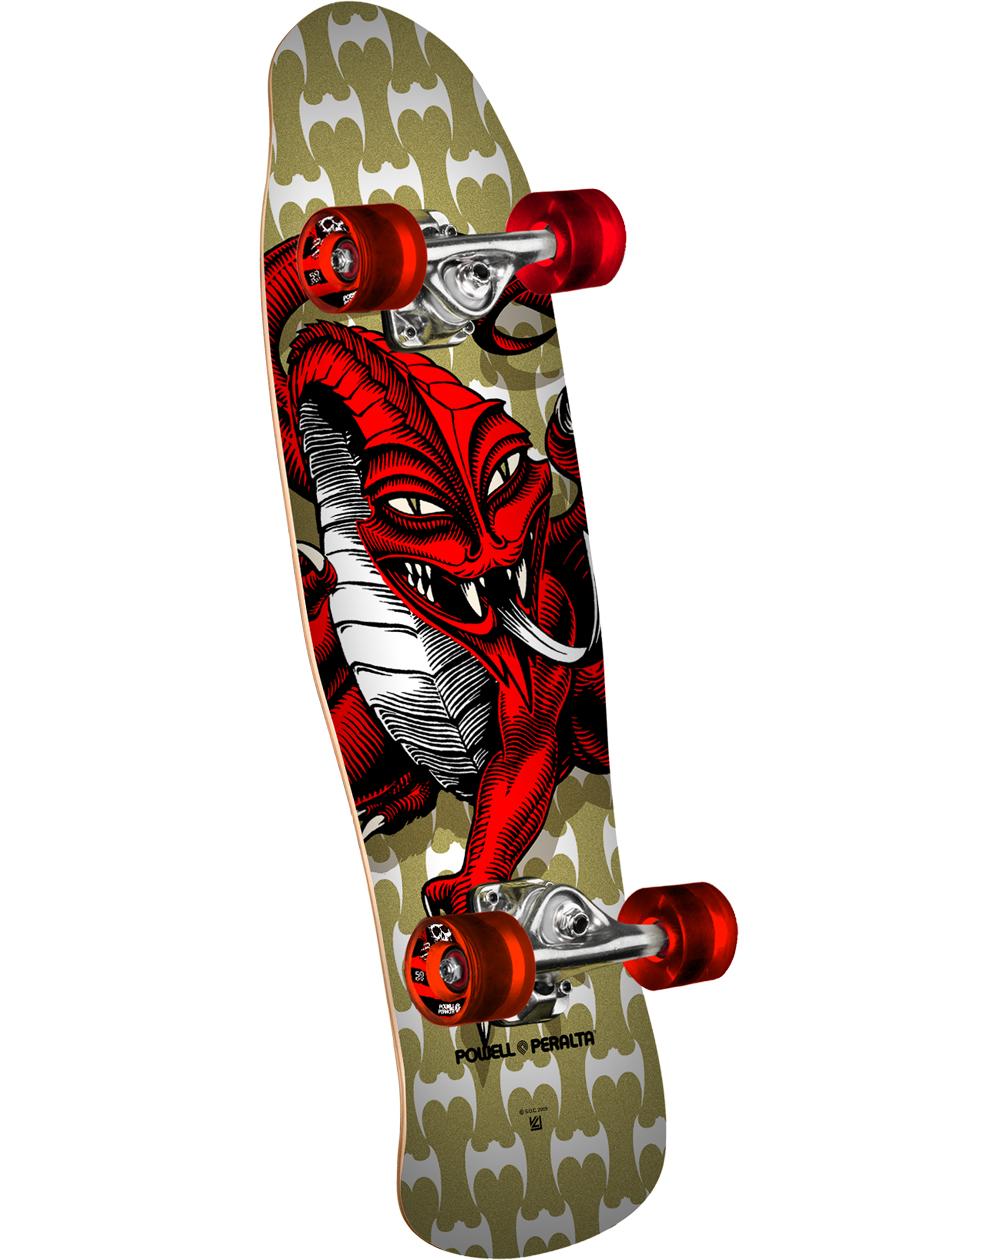 "Powell Peralta Skateboard Cruiser Mini Cab Dragon II 29.5"" Gold"